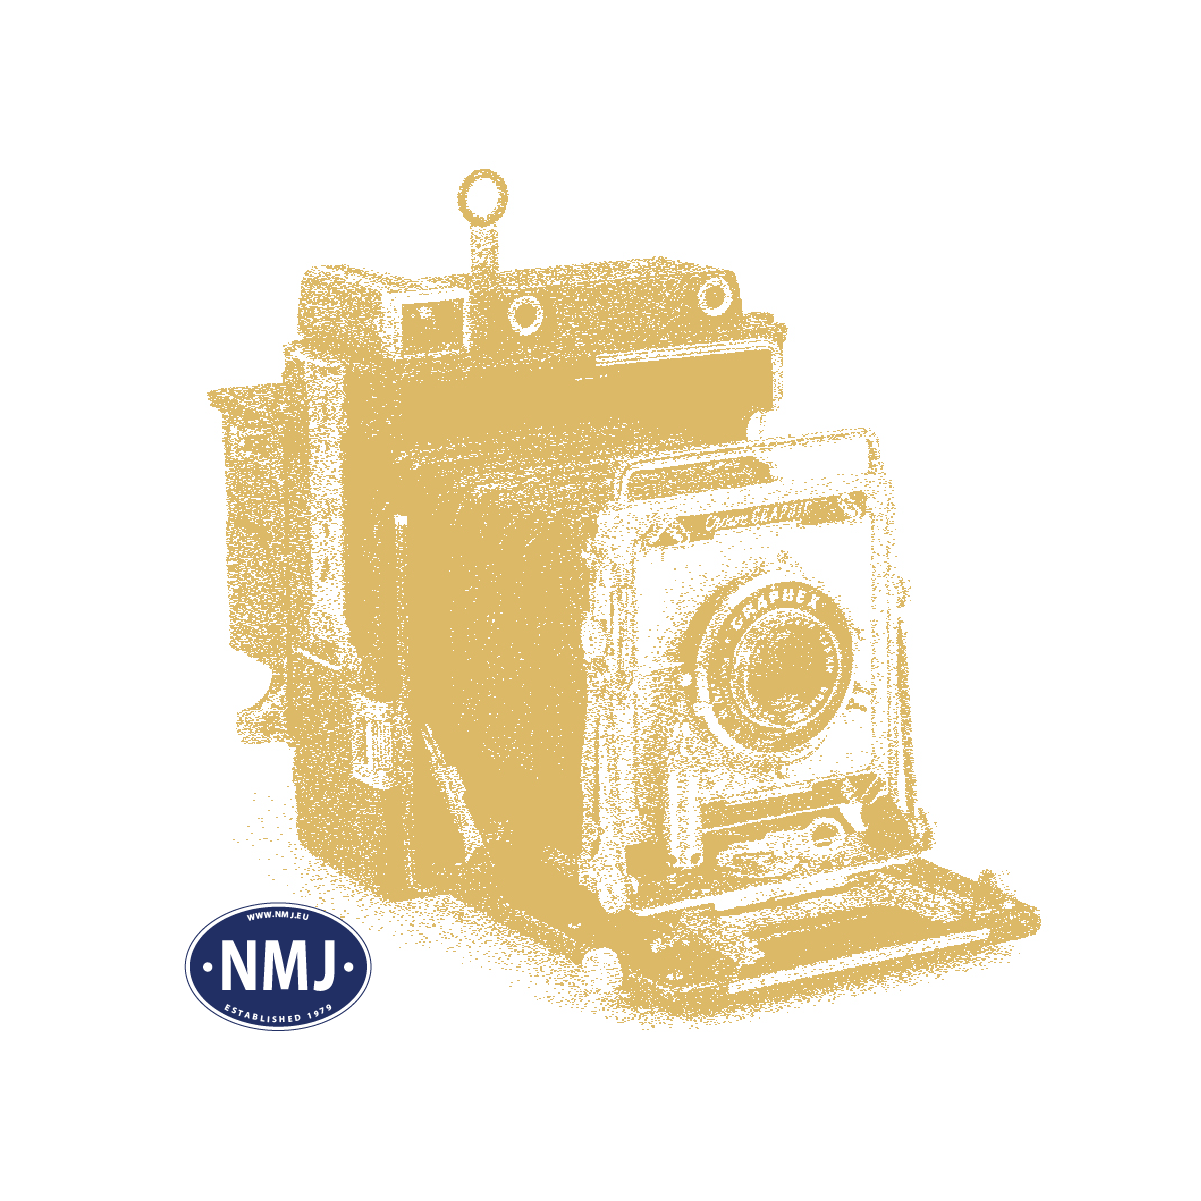 NMJT90603 - NMJ Topline Strabag TMY 1147, DCC m/ Sound